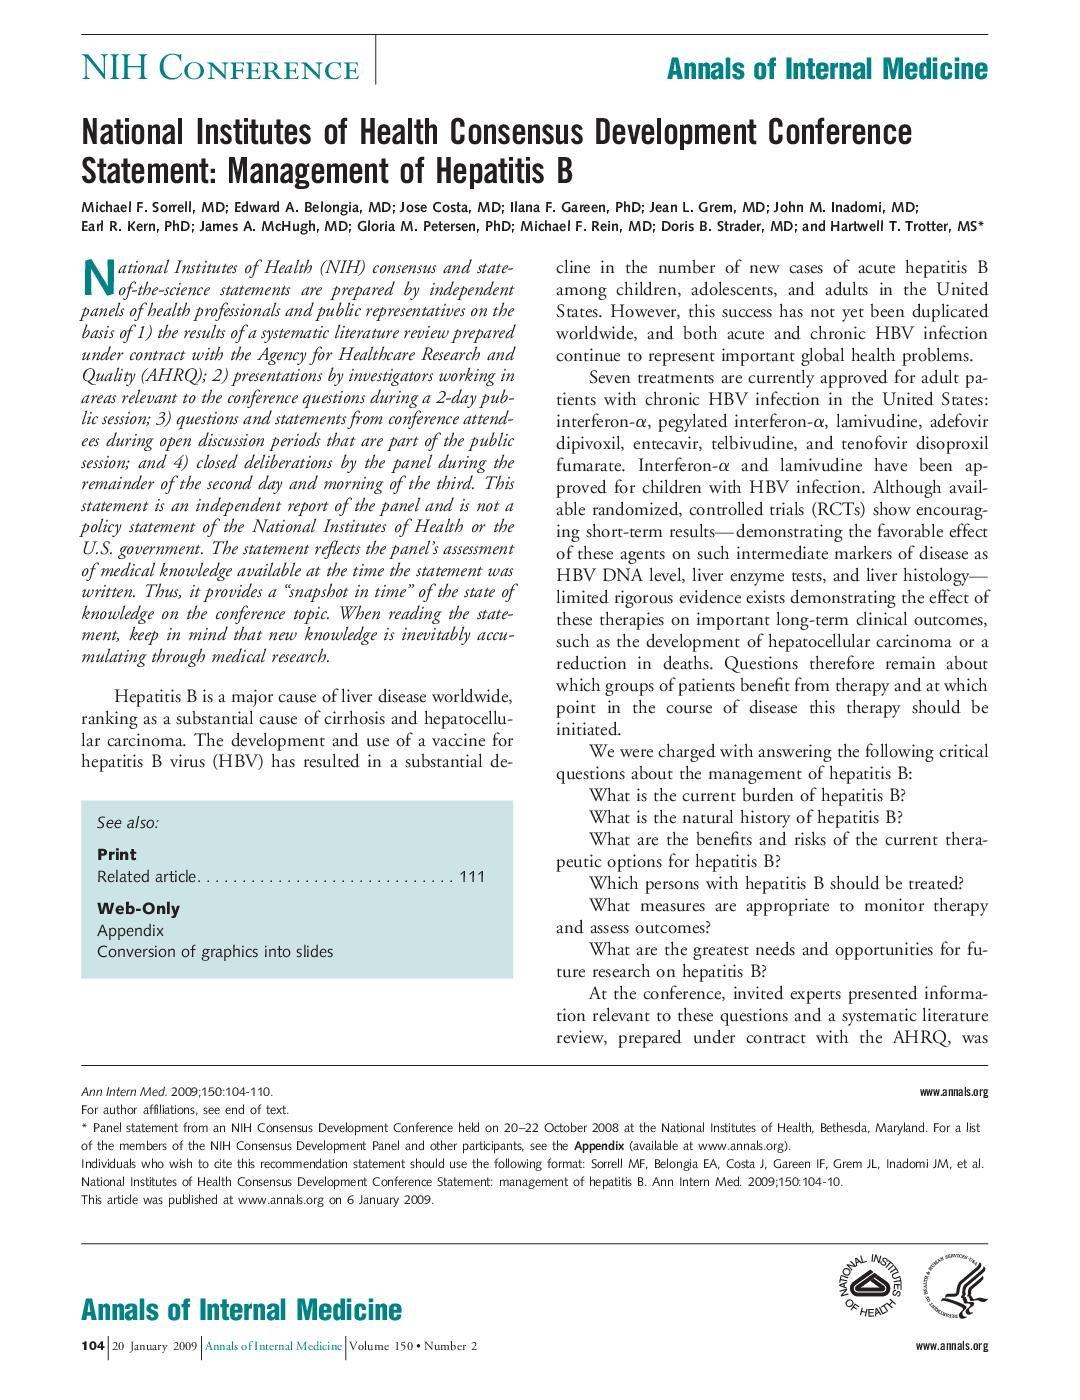 Managing Diabetes And Liver Disease Association Guidelines Consensus Development